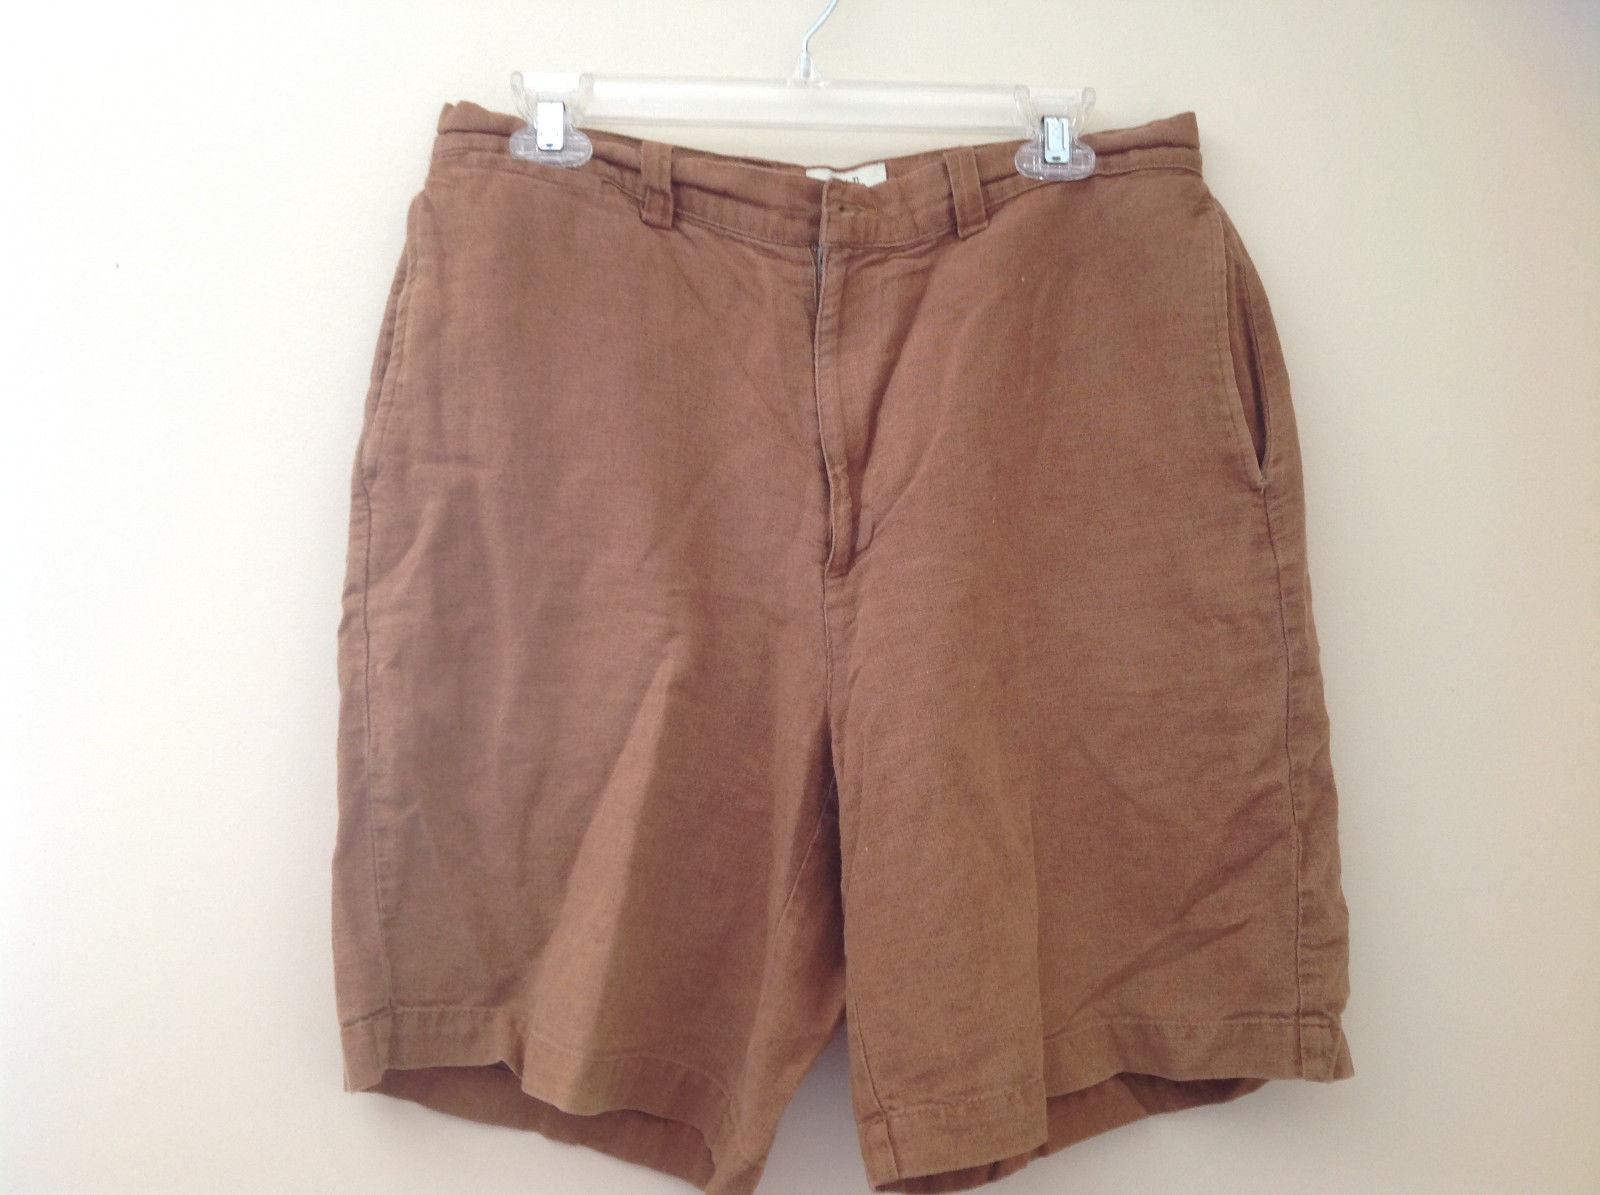 Light Brown GAP Linen Casual Shorts 4 Pockets Button and Zipper Closure Size 33